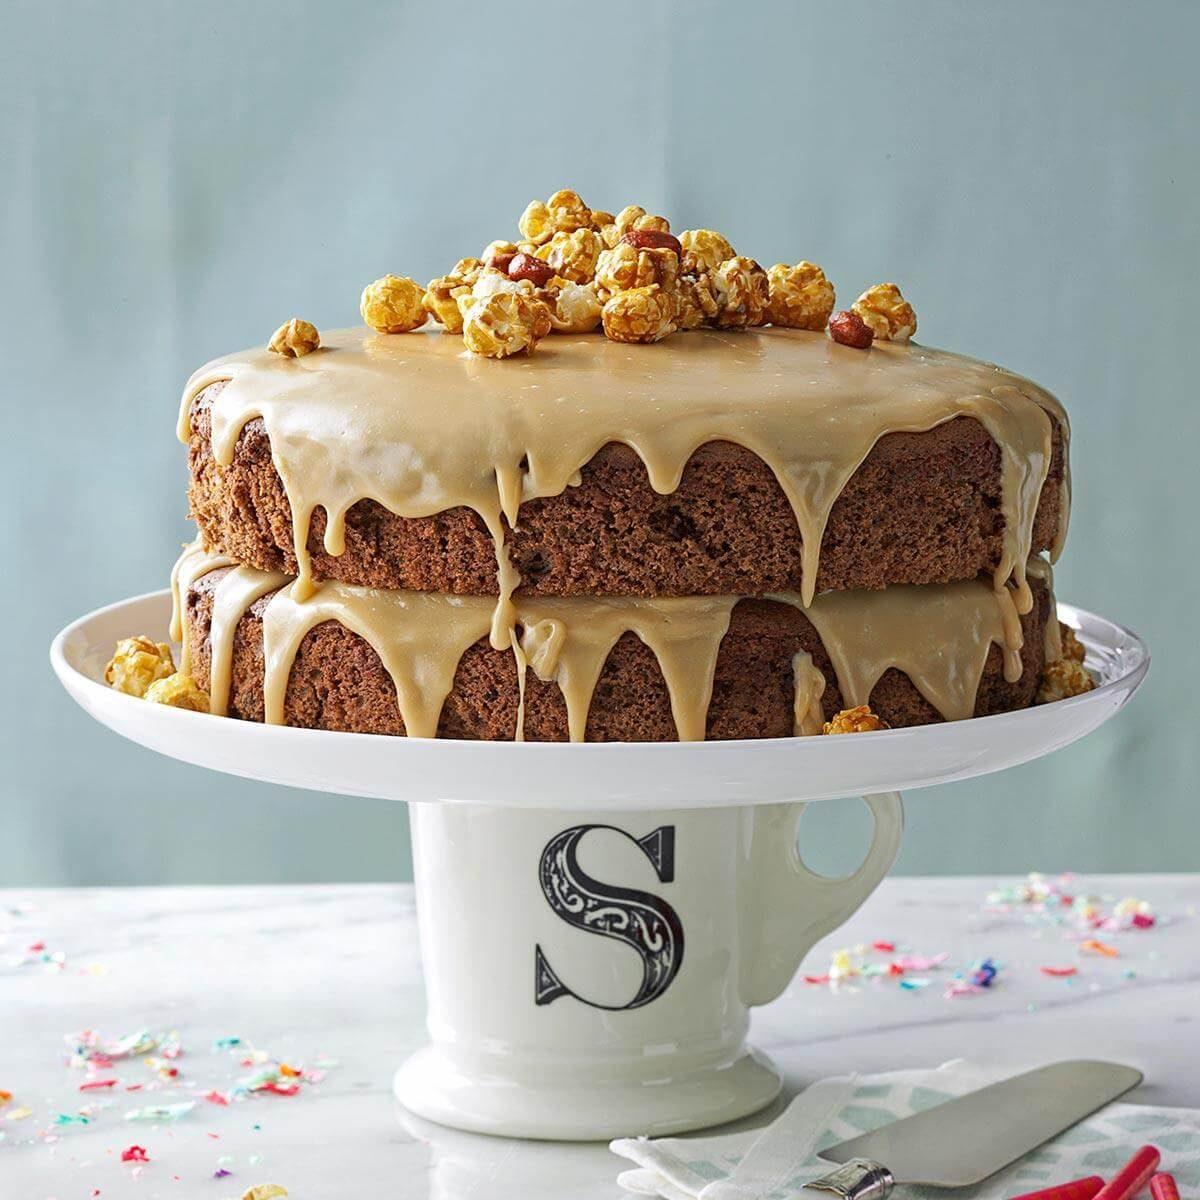 Chocolate Spice Cake With Caramel Icing Recipe